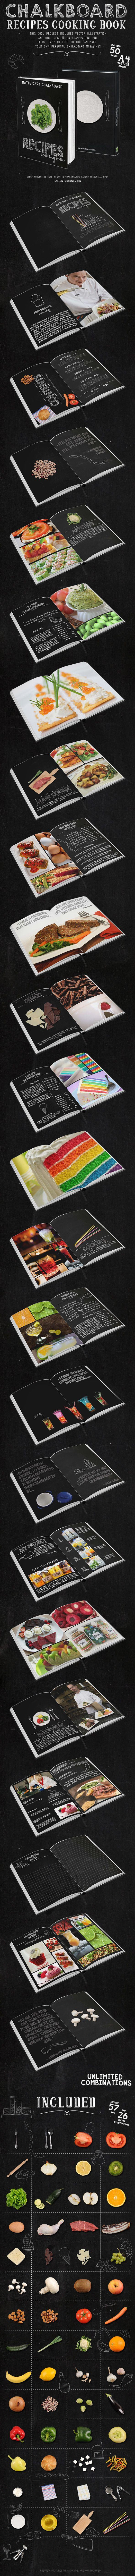 7 best recipe book template images on pinterest cookbook ideas